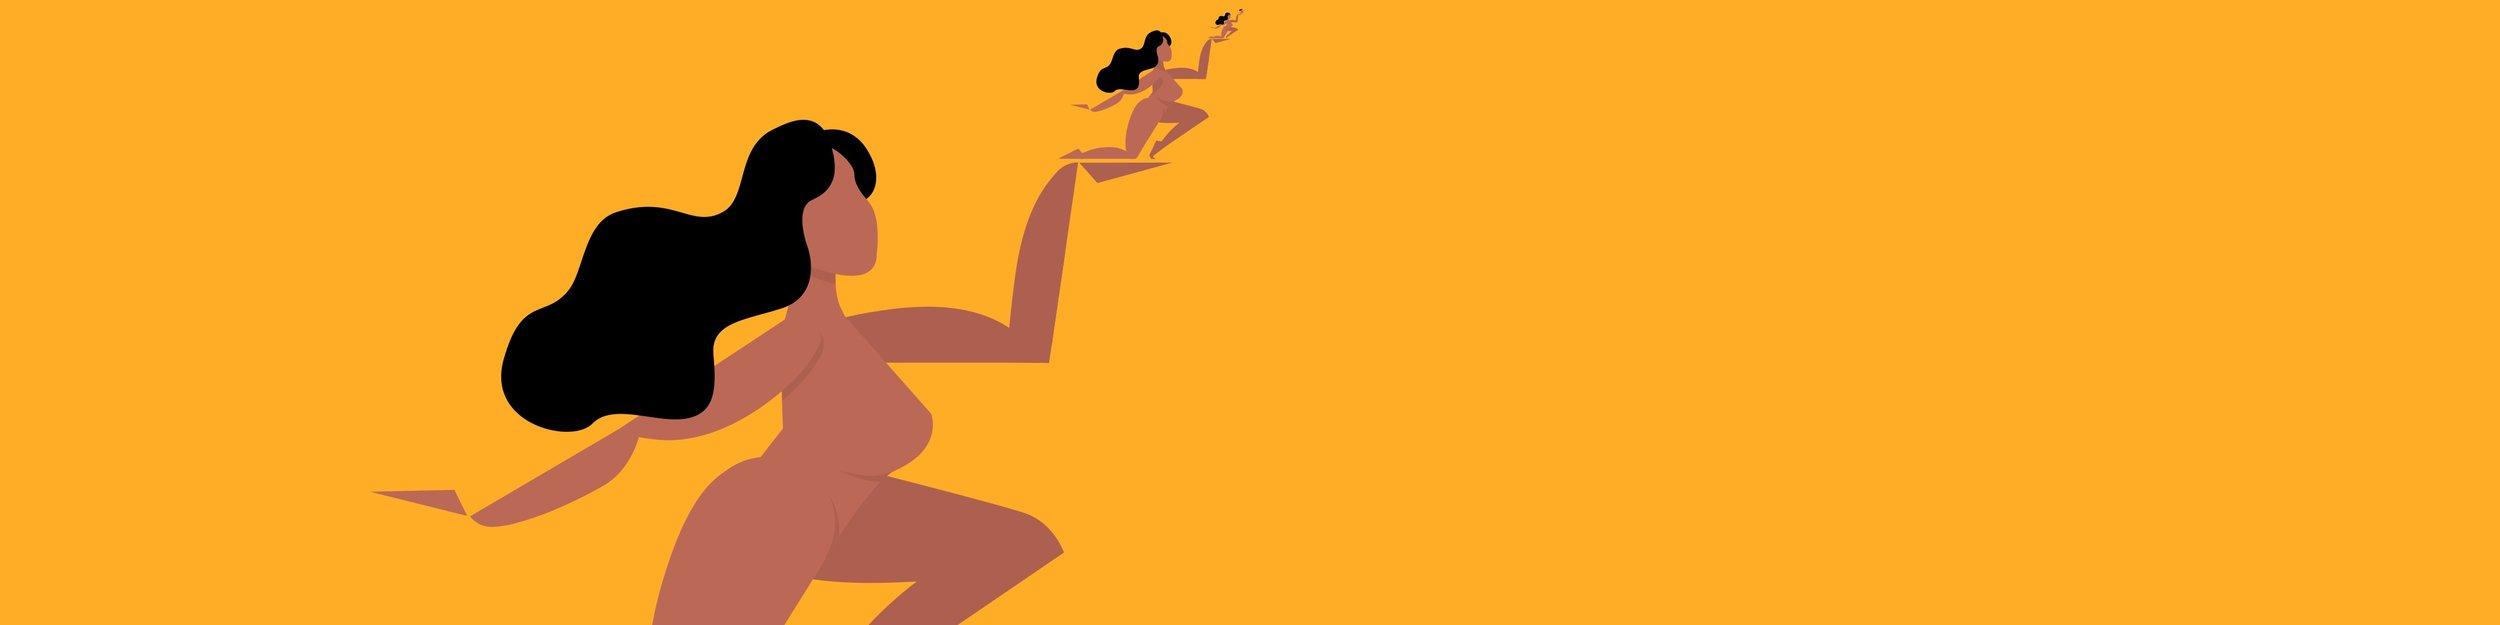 uplifting women comp.jpg